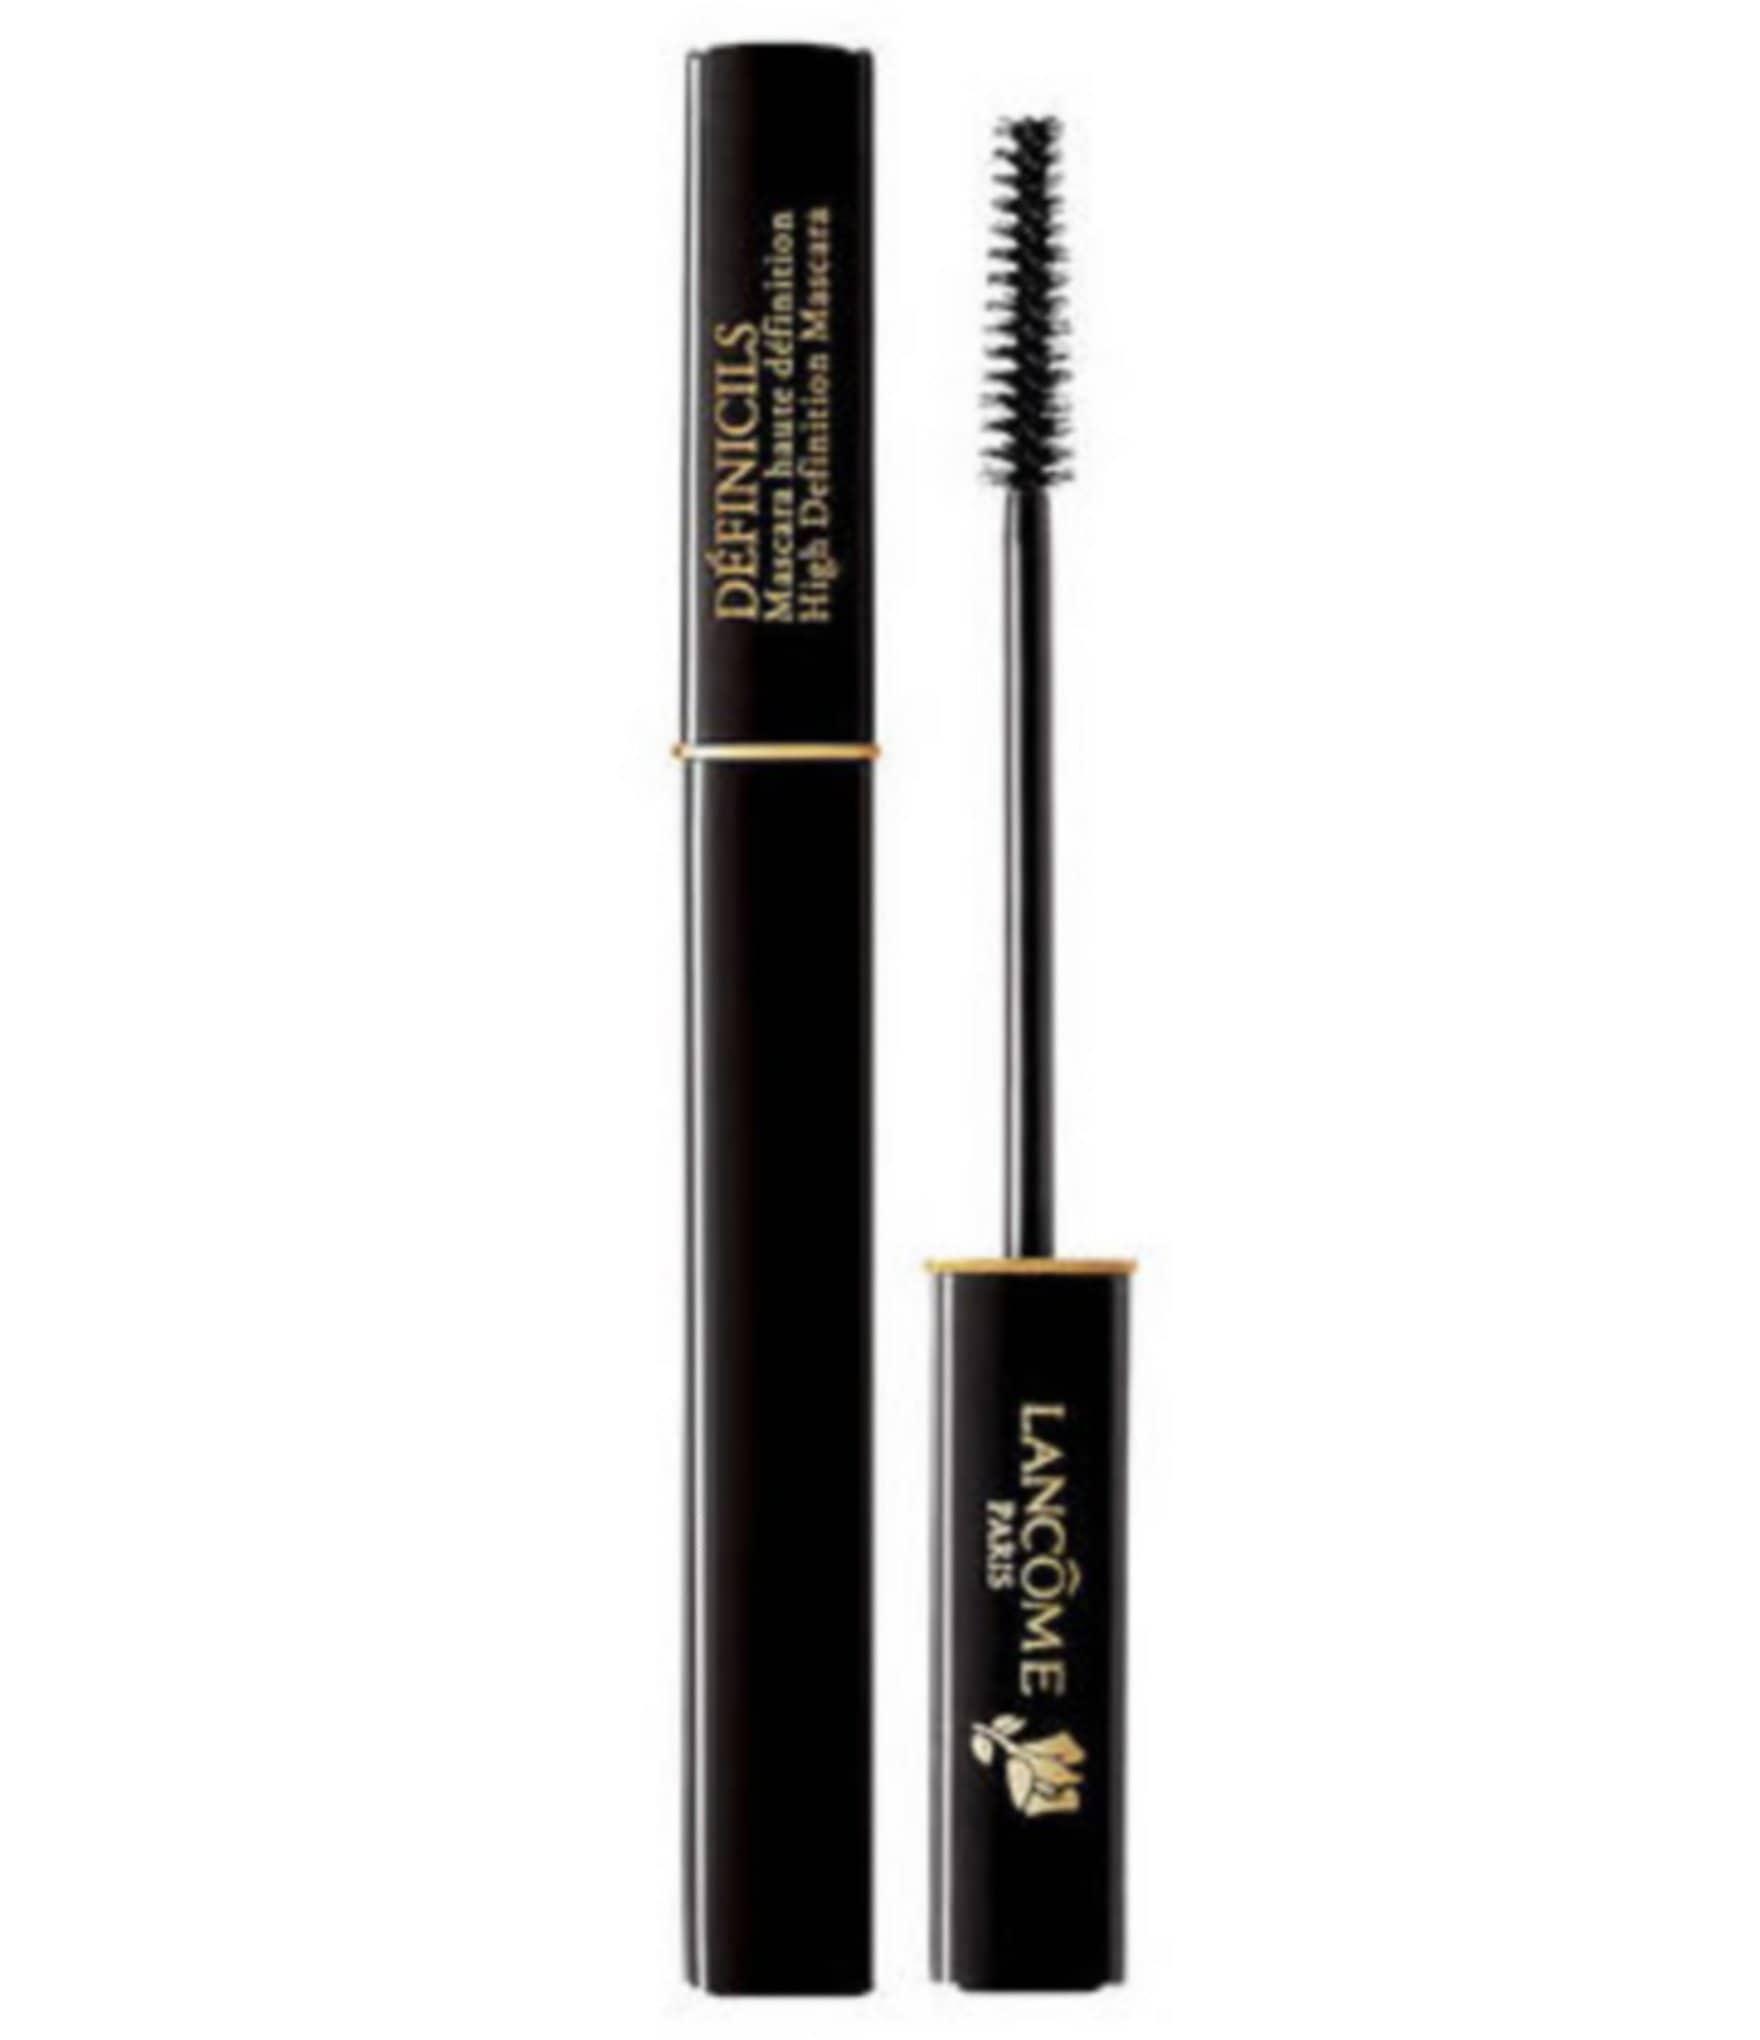 Chanel Makeup Australia S